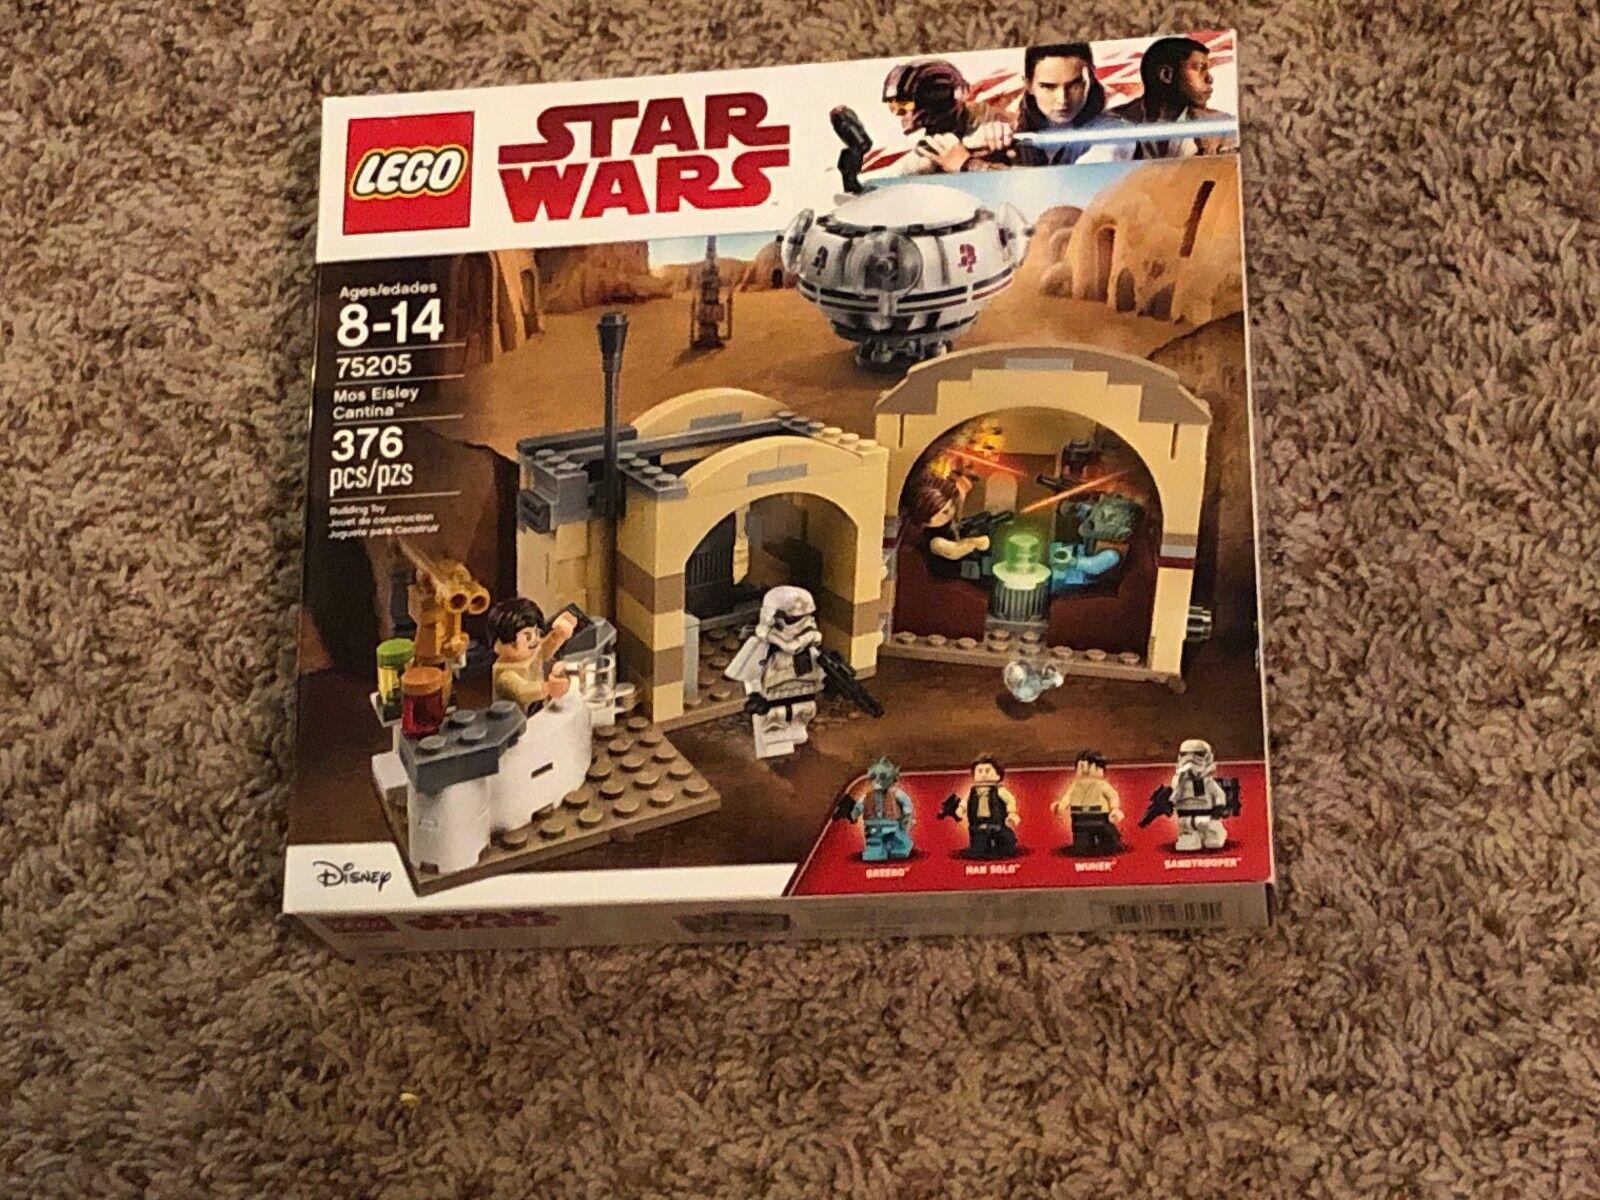 Star Wars LEGO 75205 MOS EISLEY CANTINA NEW SEALED SOLO GREEDO WUHER RARE